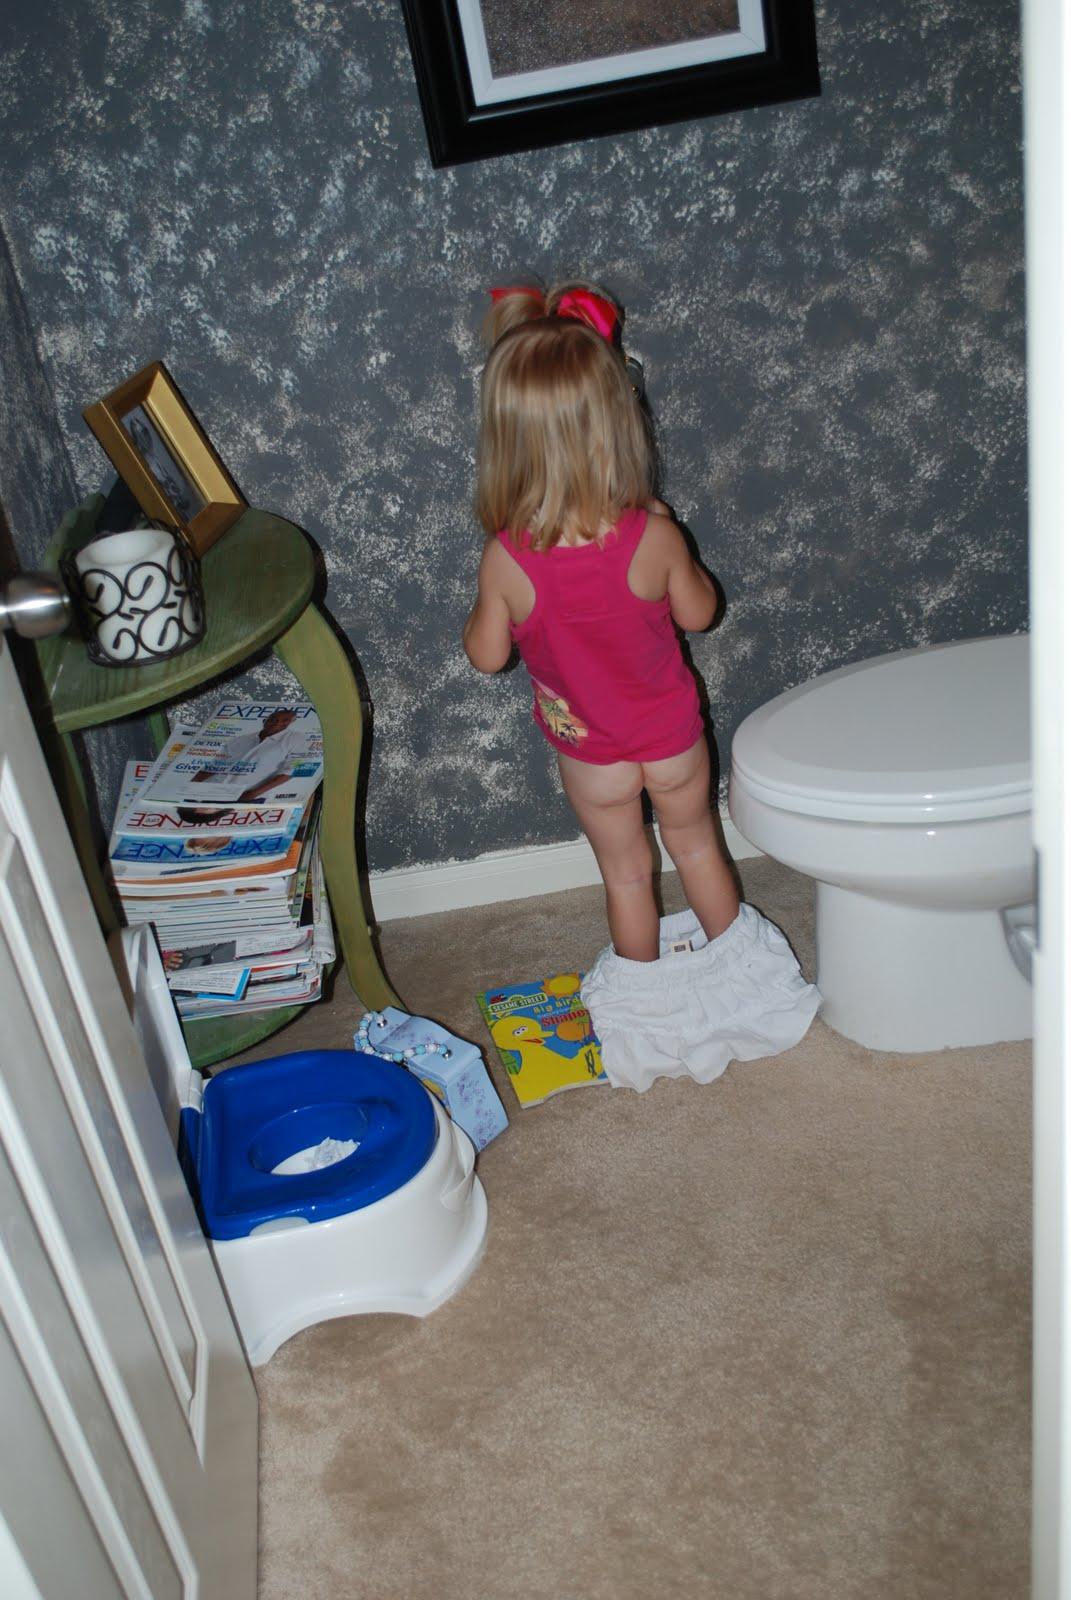 Little Girl Sitting On Potty - newhairstylesformen2014.com